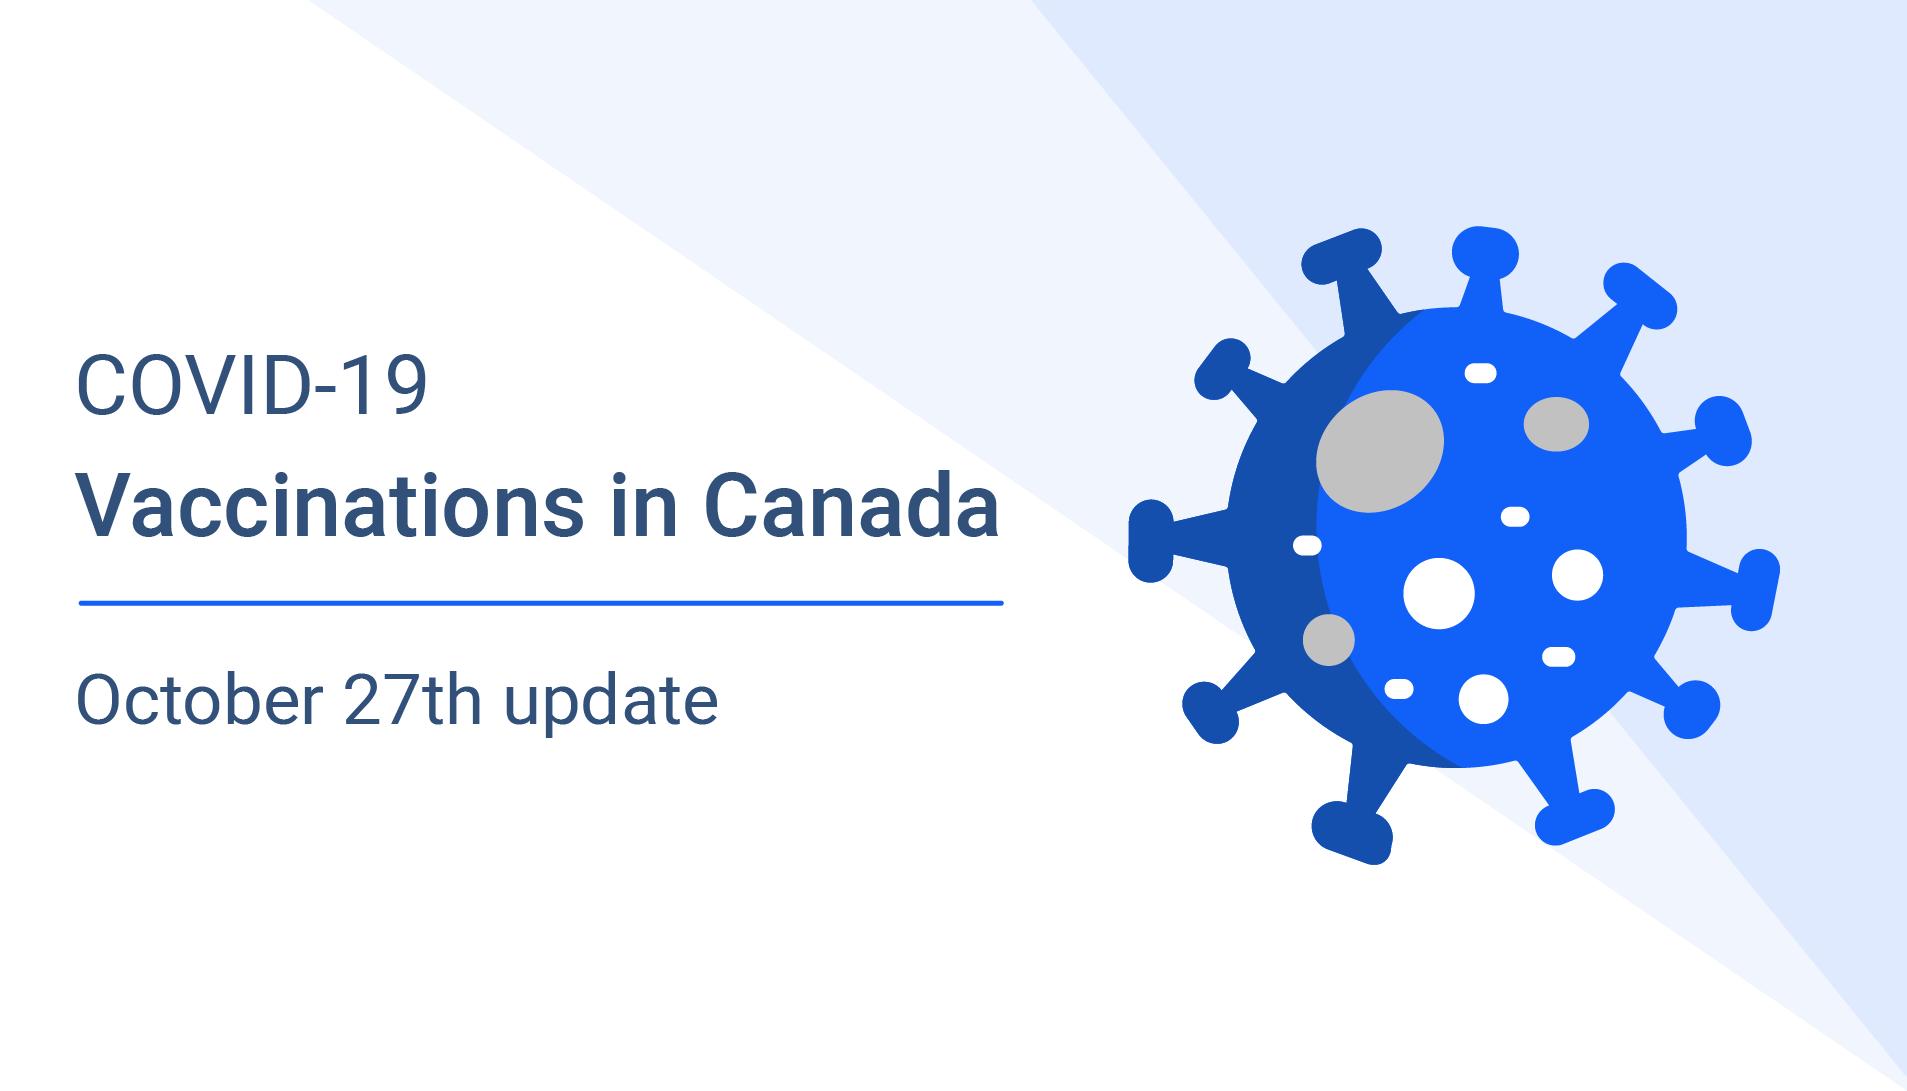 COVID-19 Vaccinations in Canada